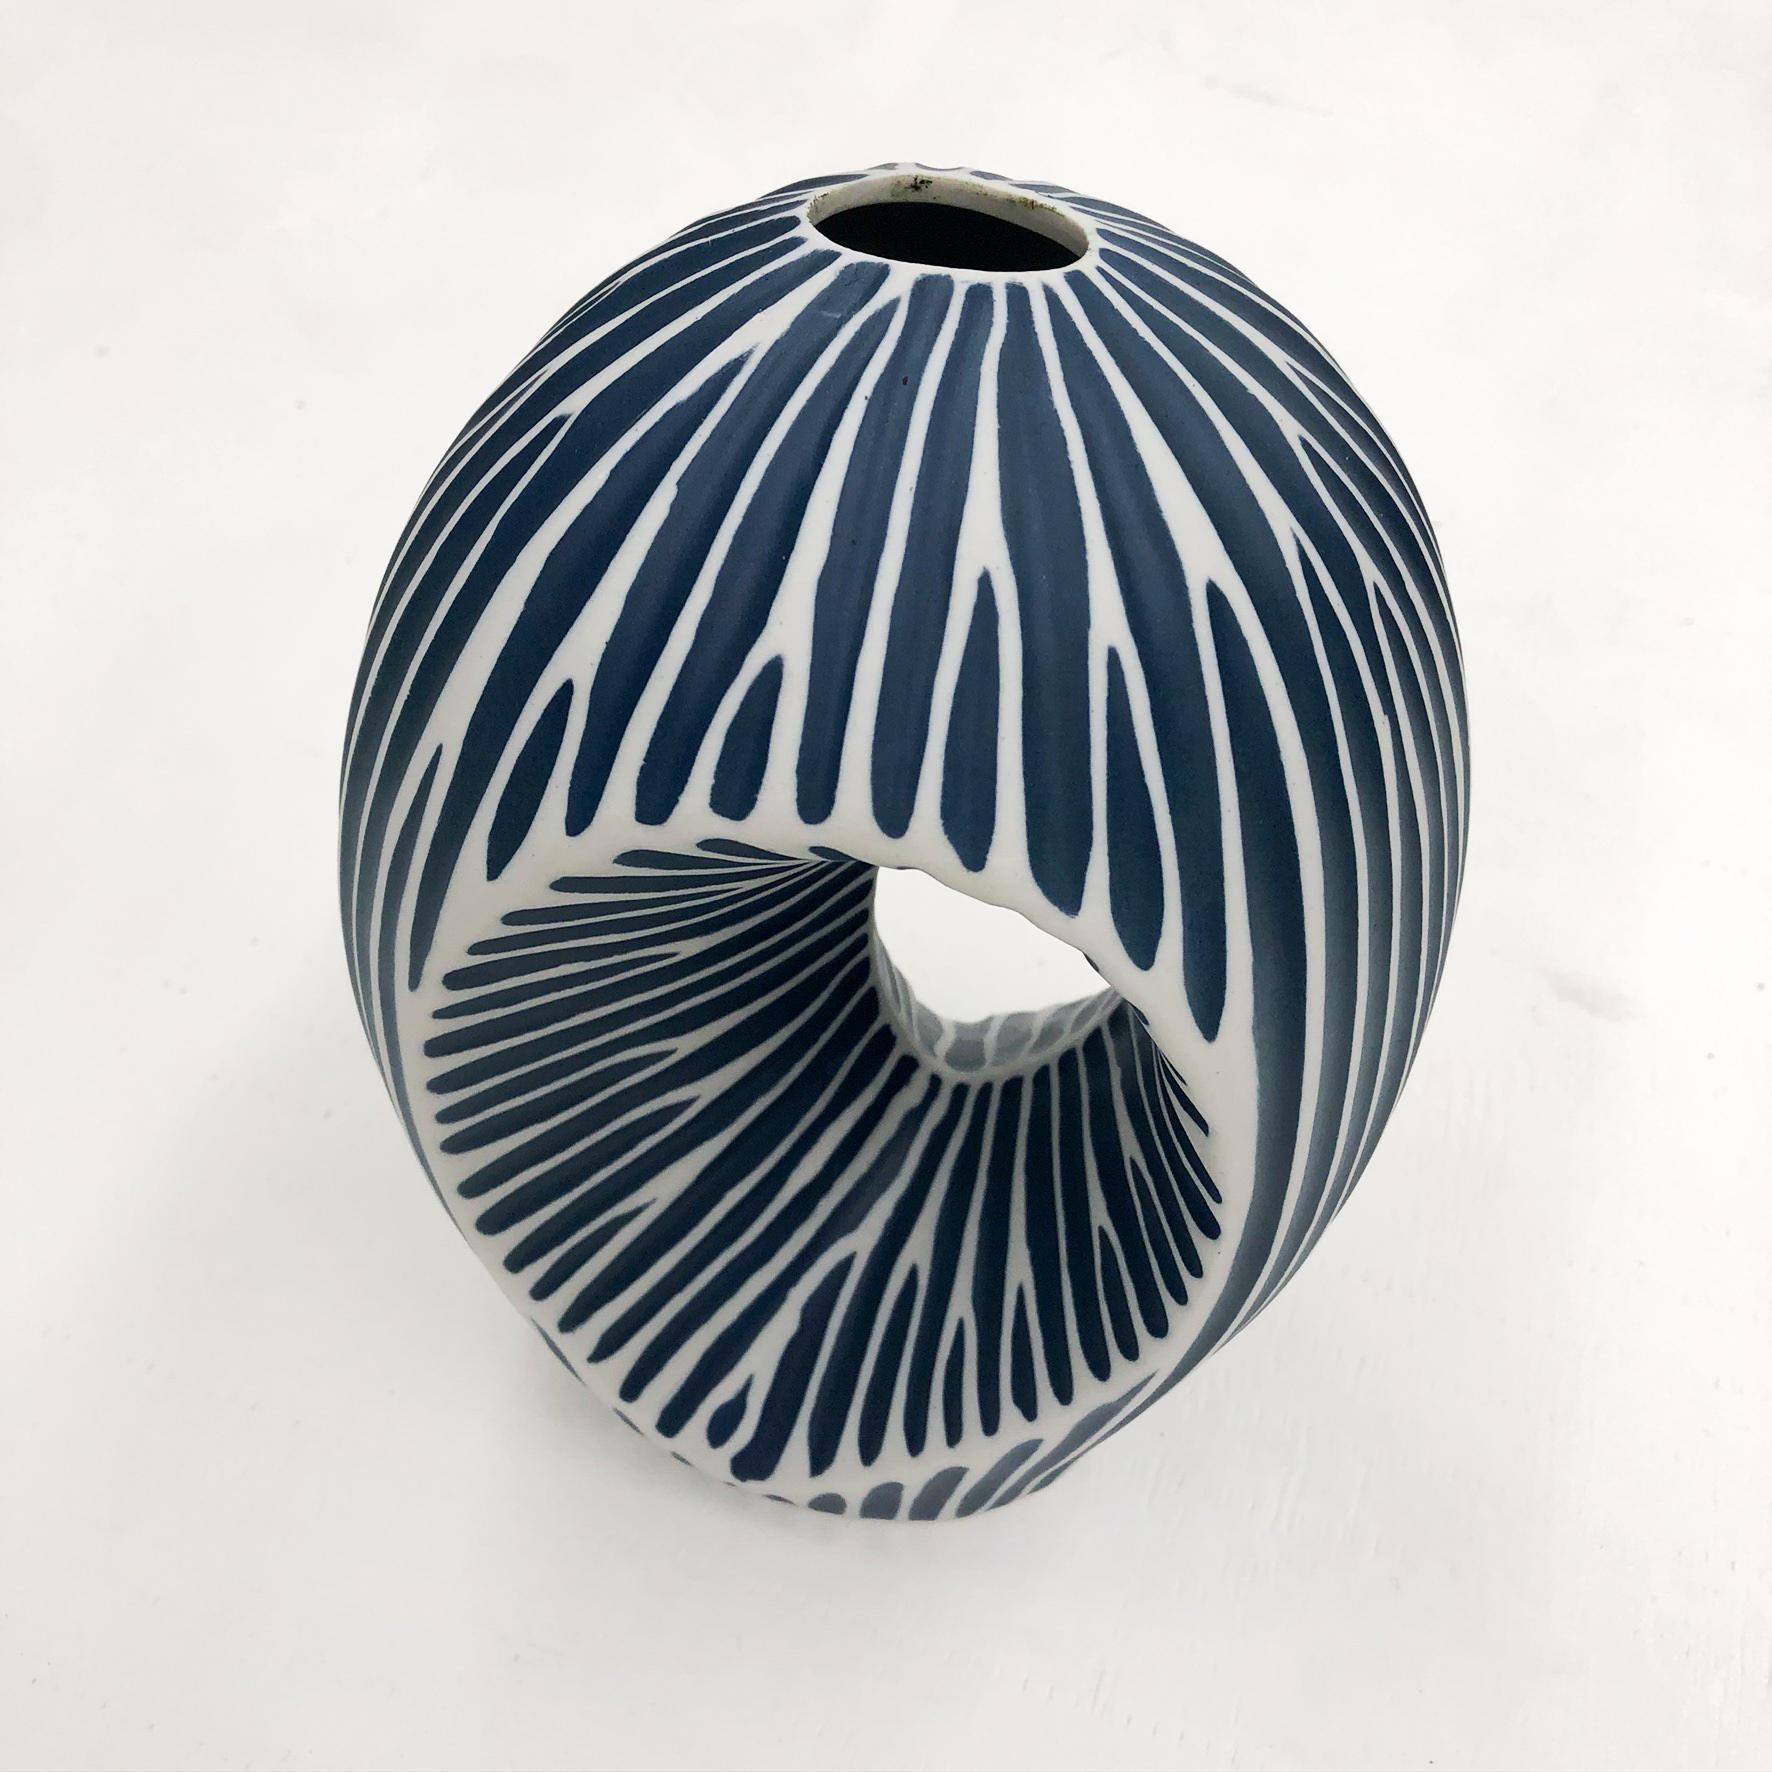 Artura MX Handmade Vase - top view